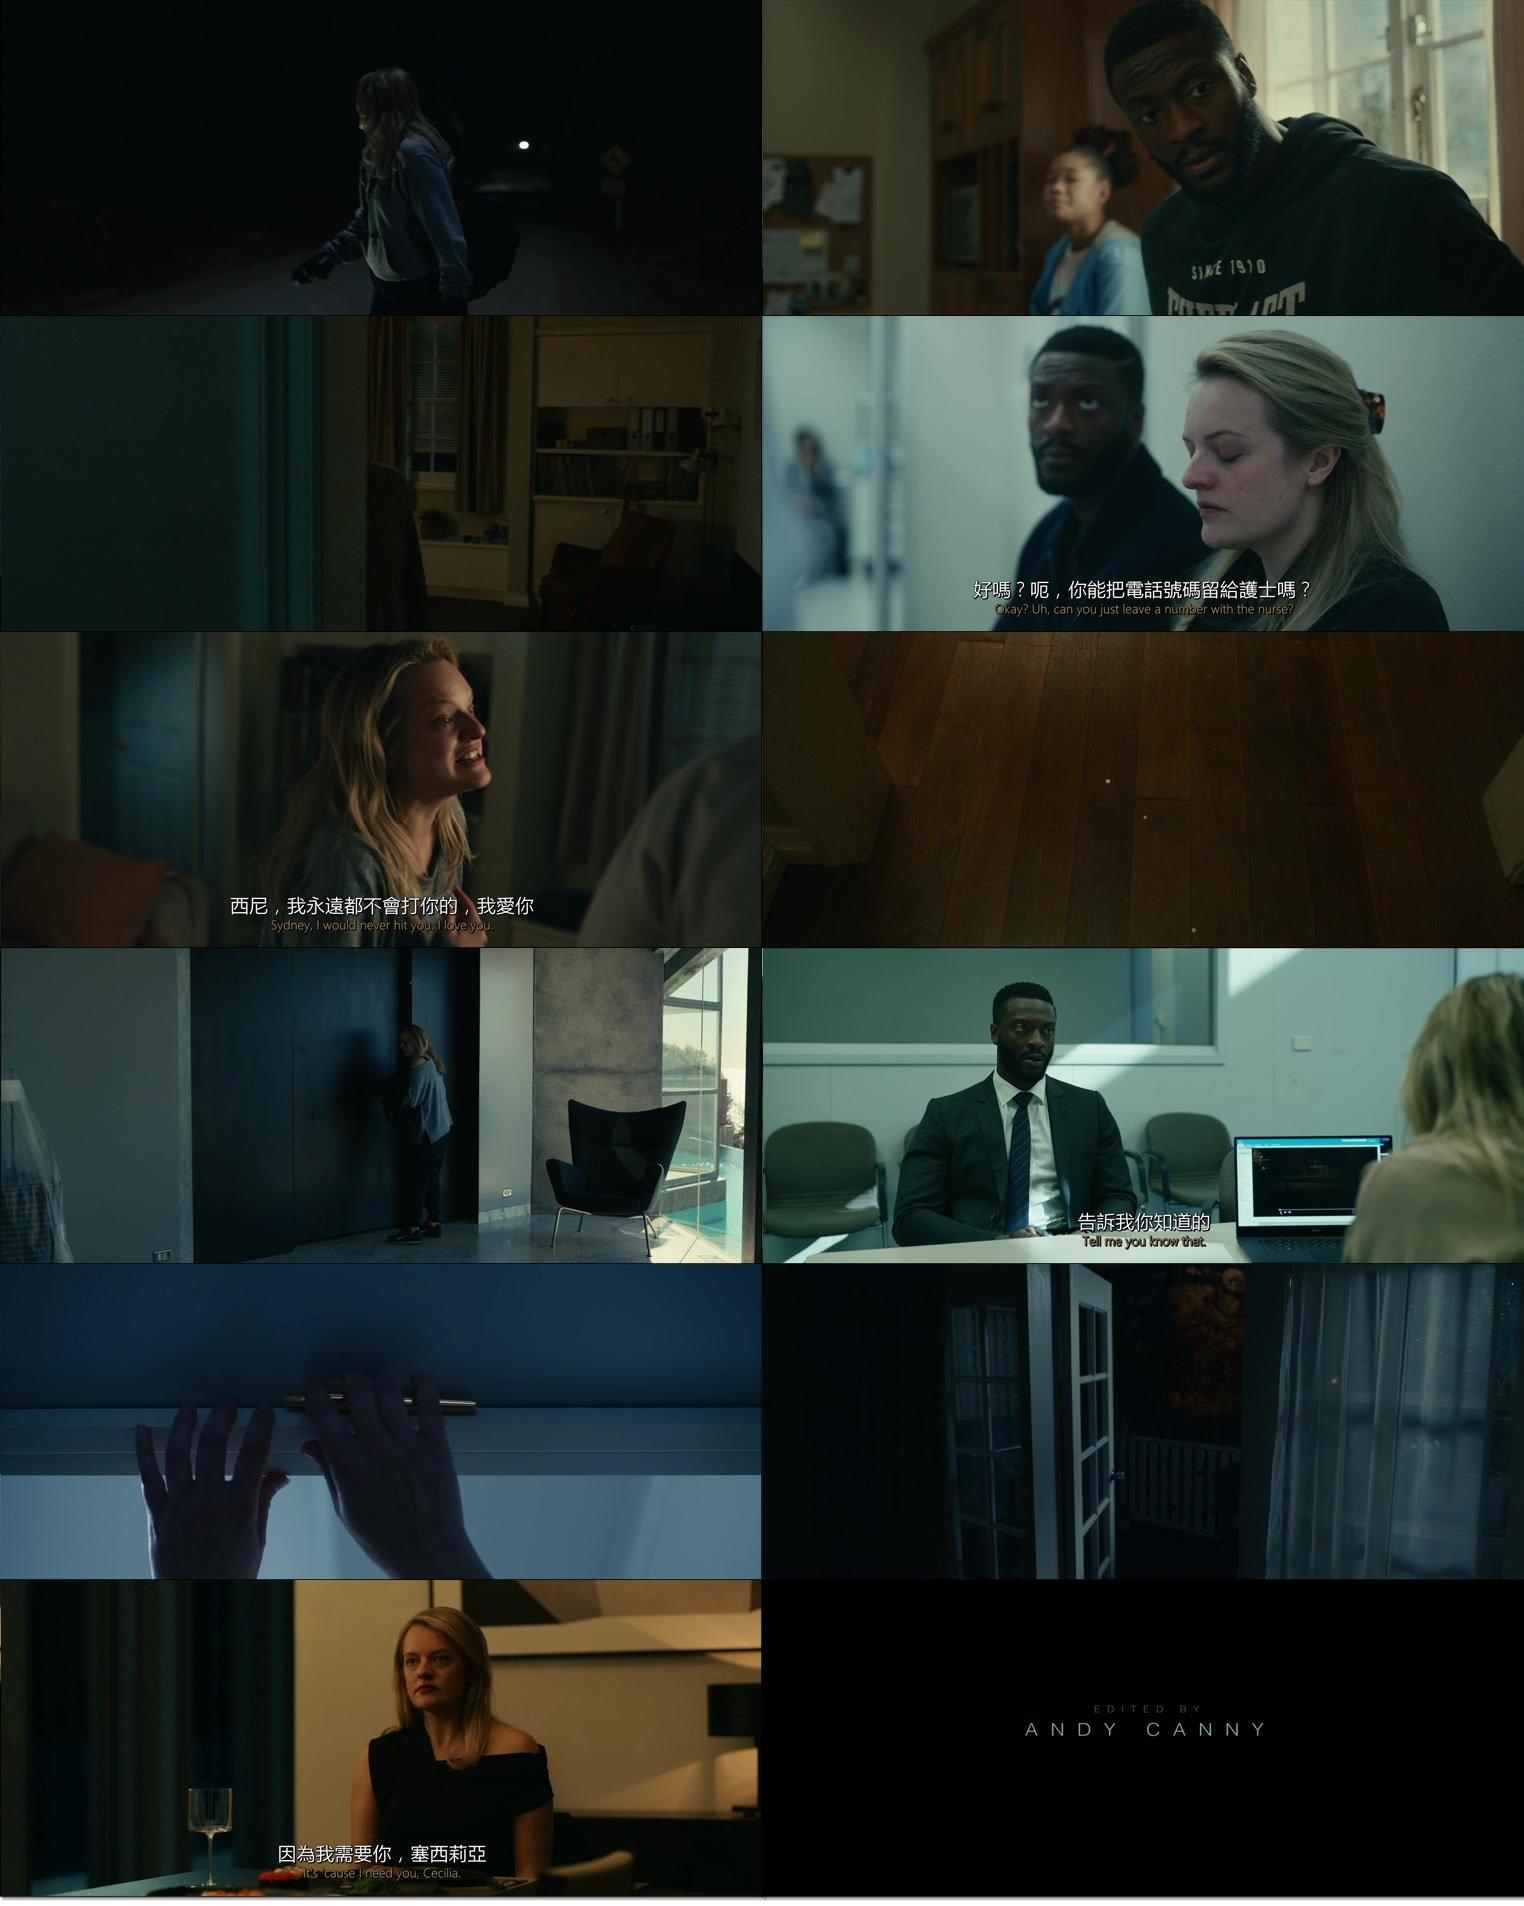 The.Invisible.Man.2020.1080p.AMZN.WEB-DL.DDP5.1.H.264-NTG.mkv